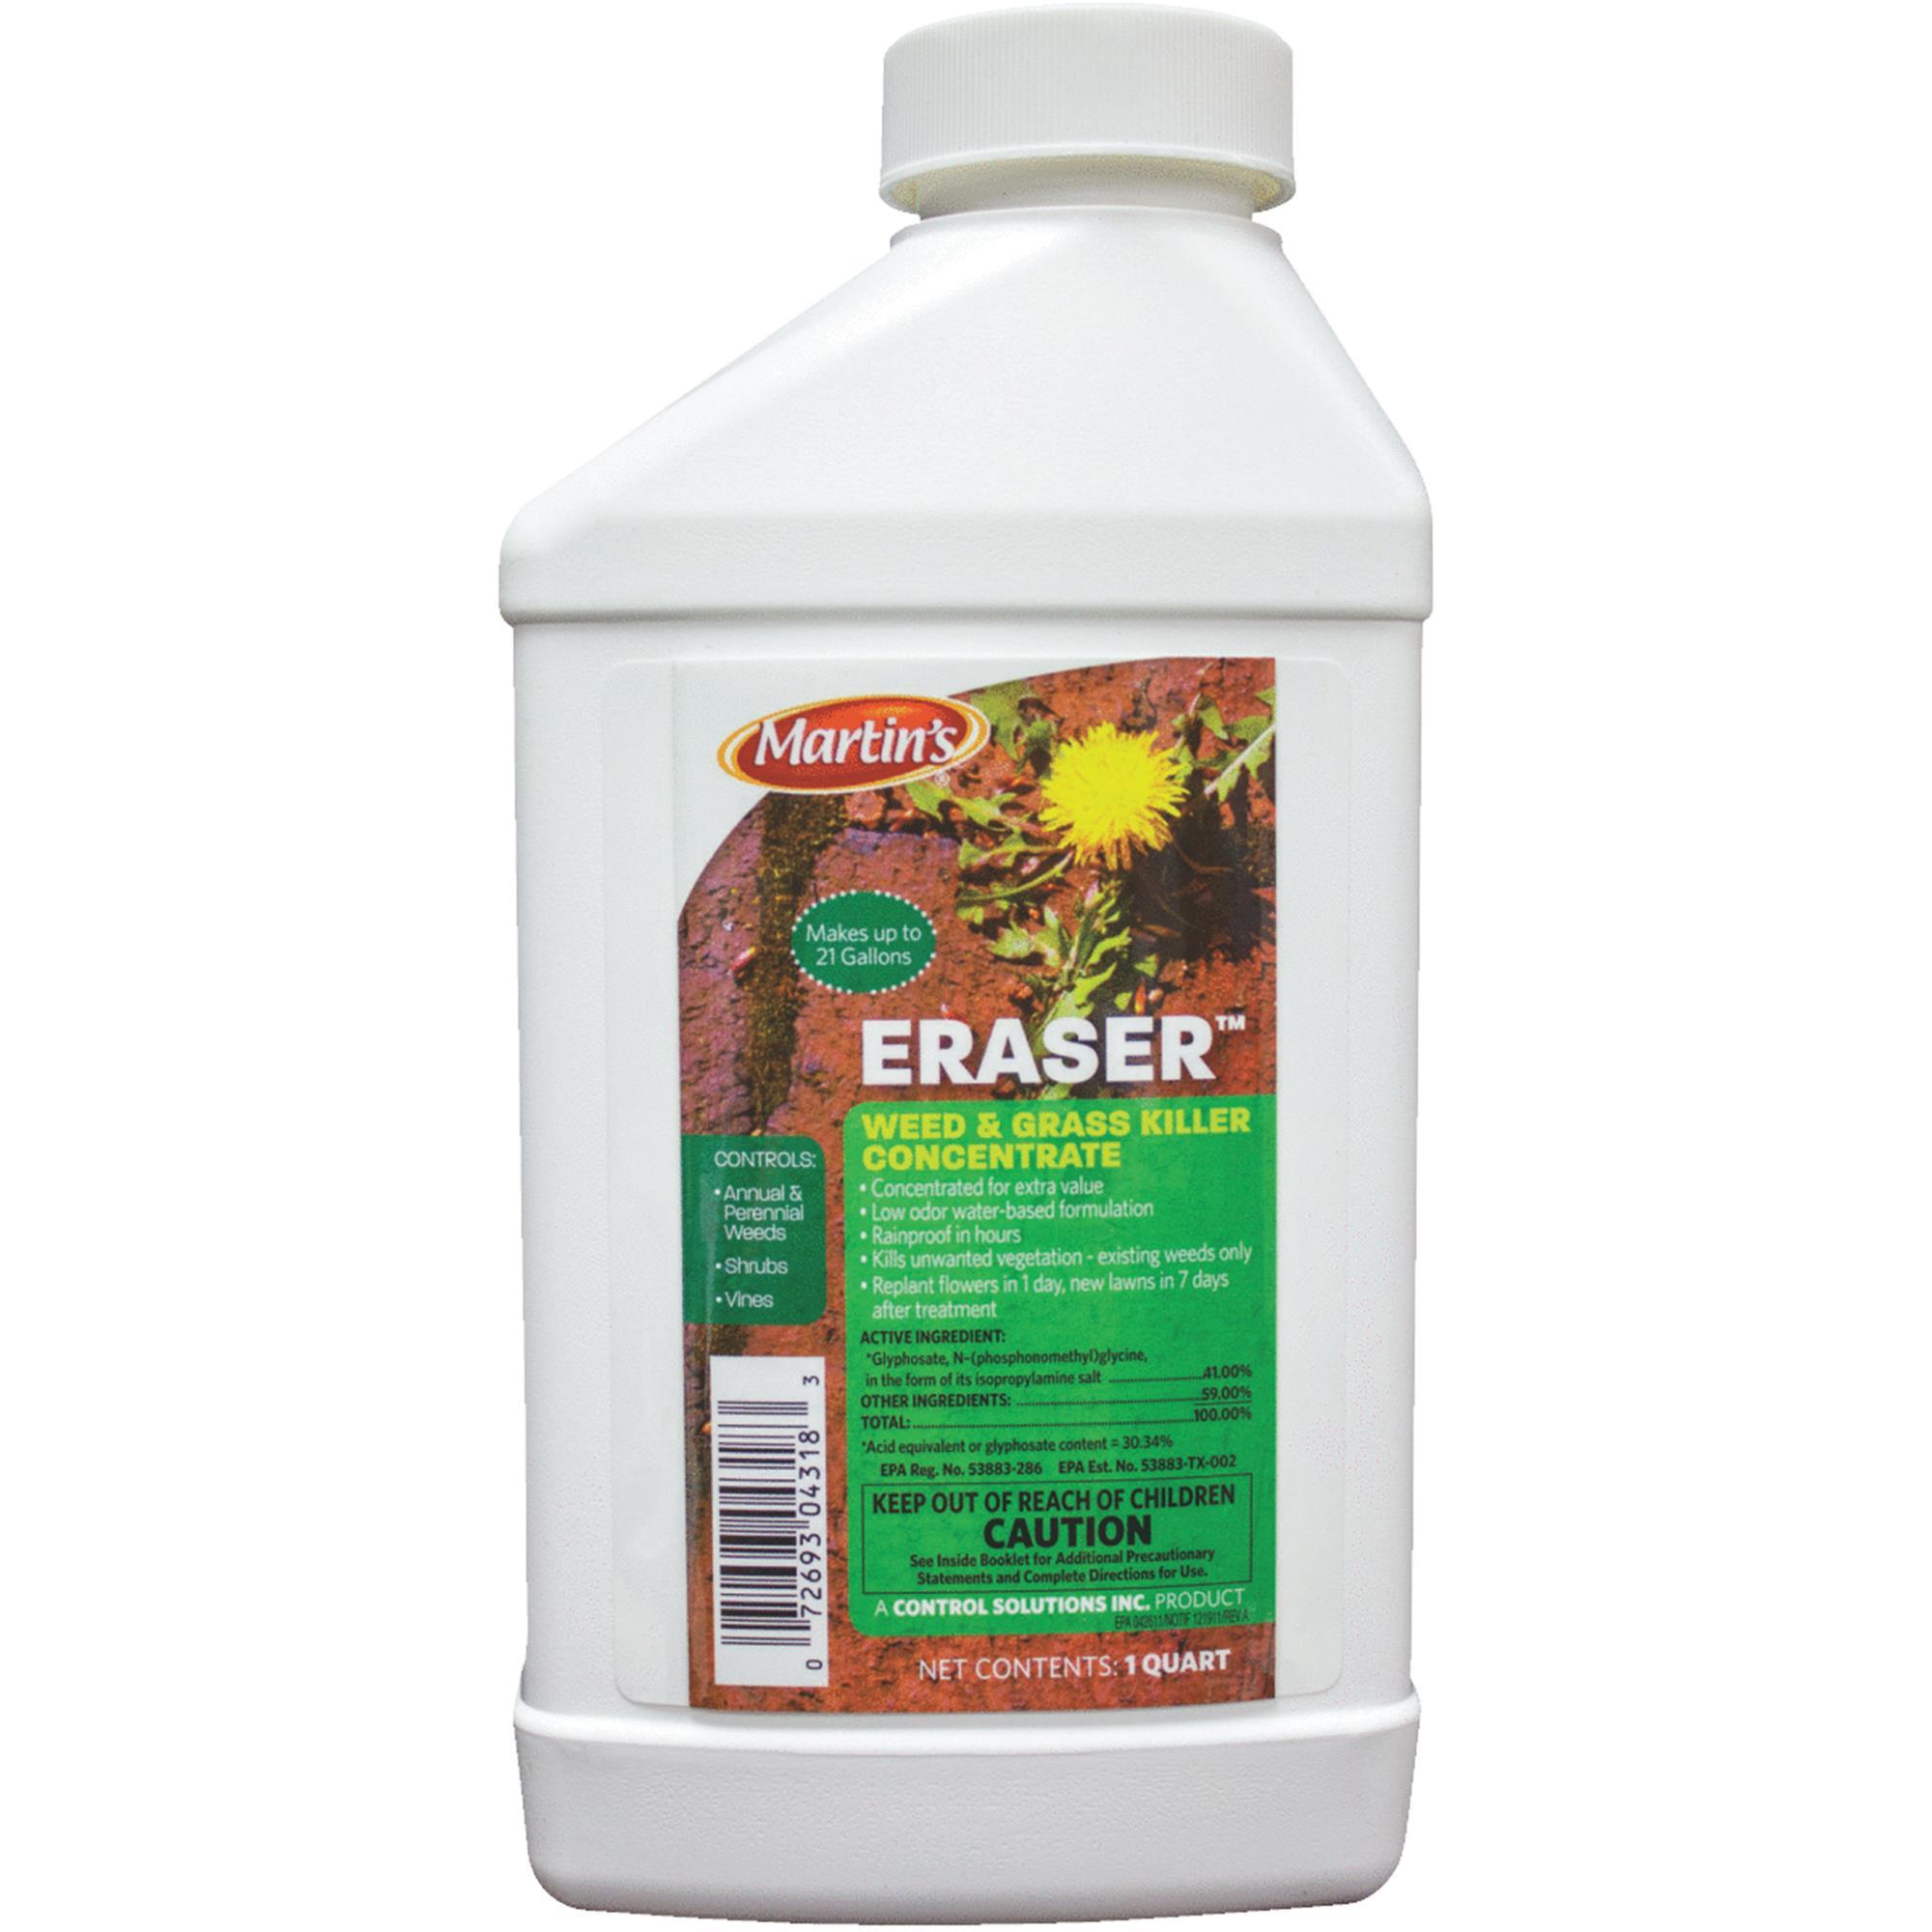 Martin's Eraser Weed & Grass Killer